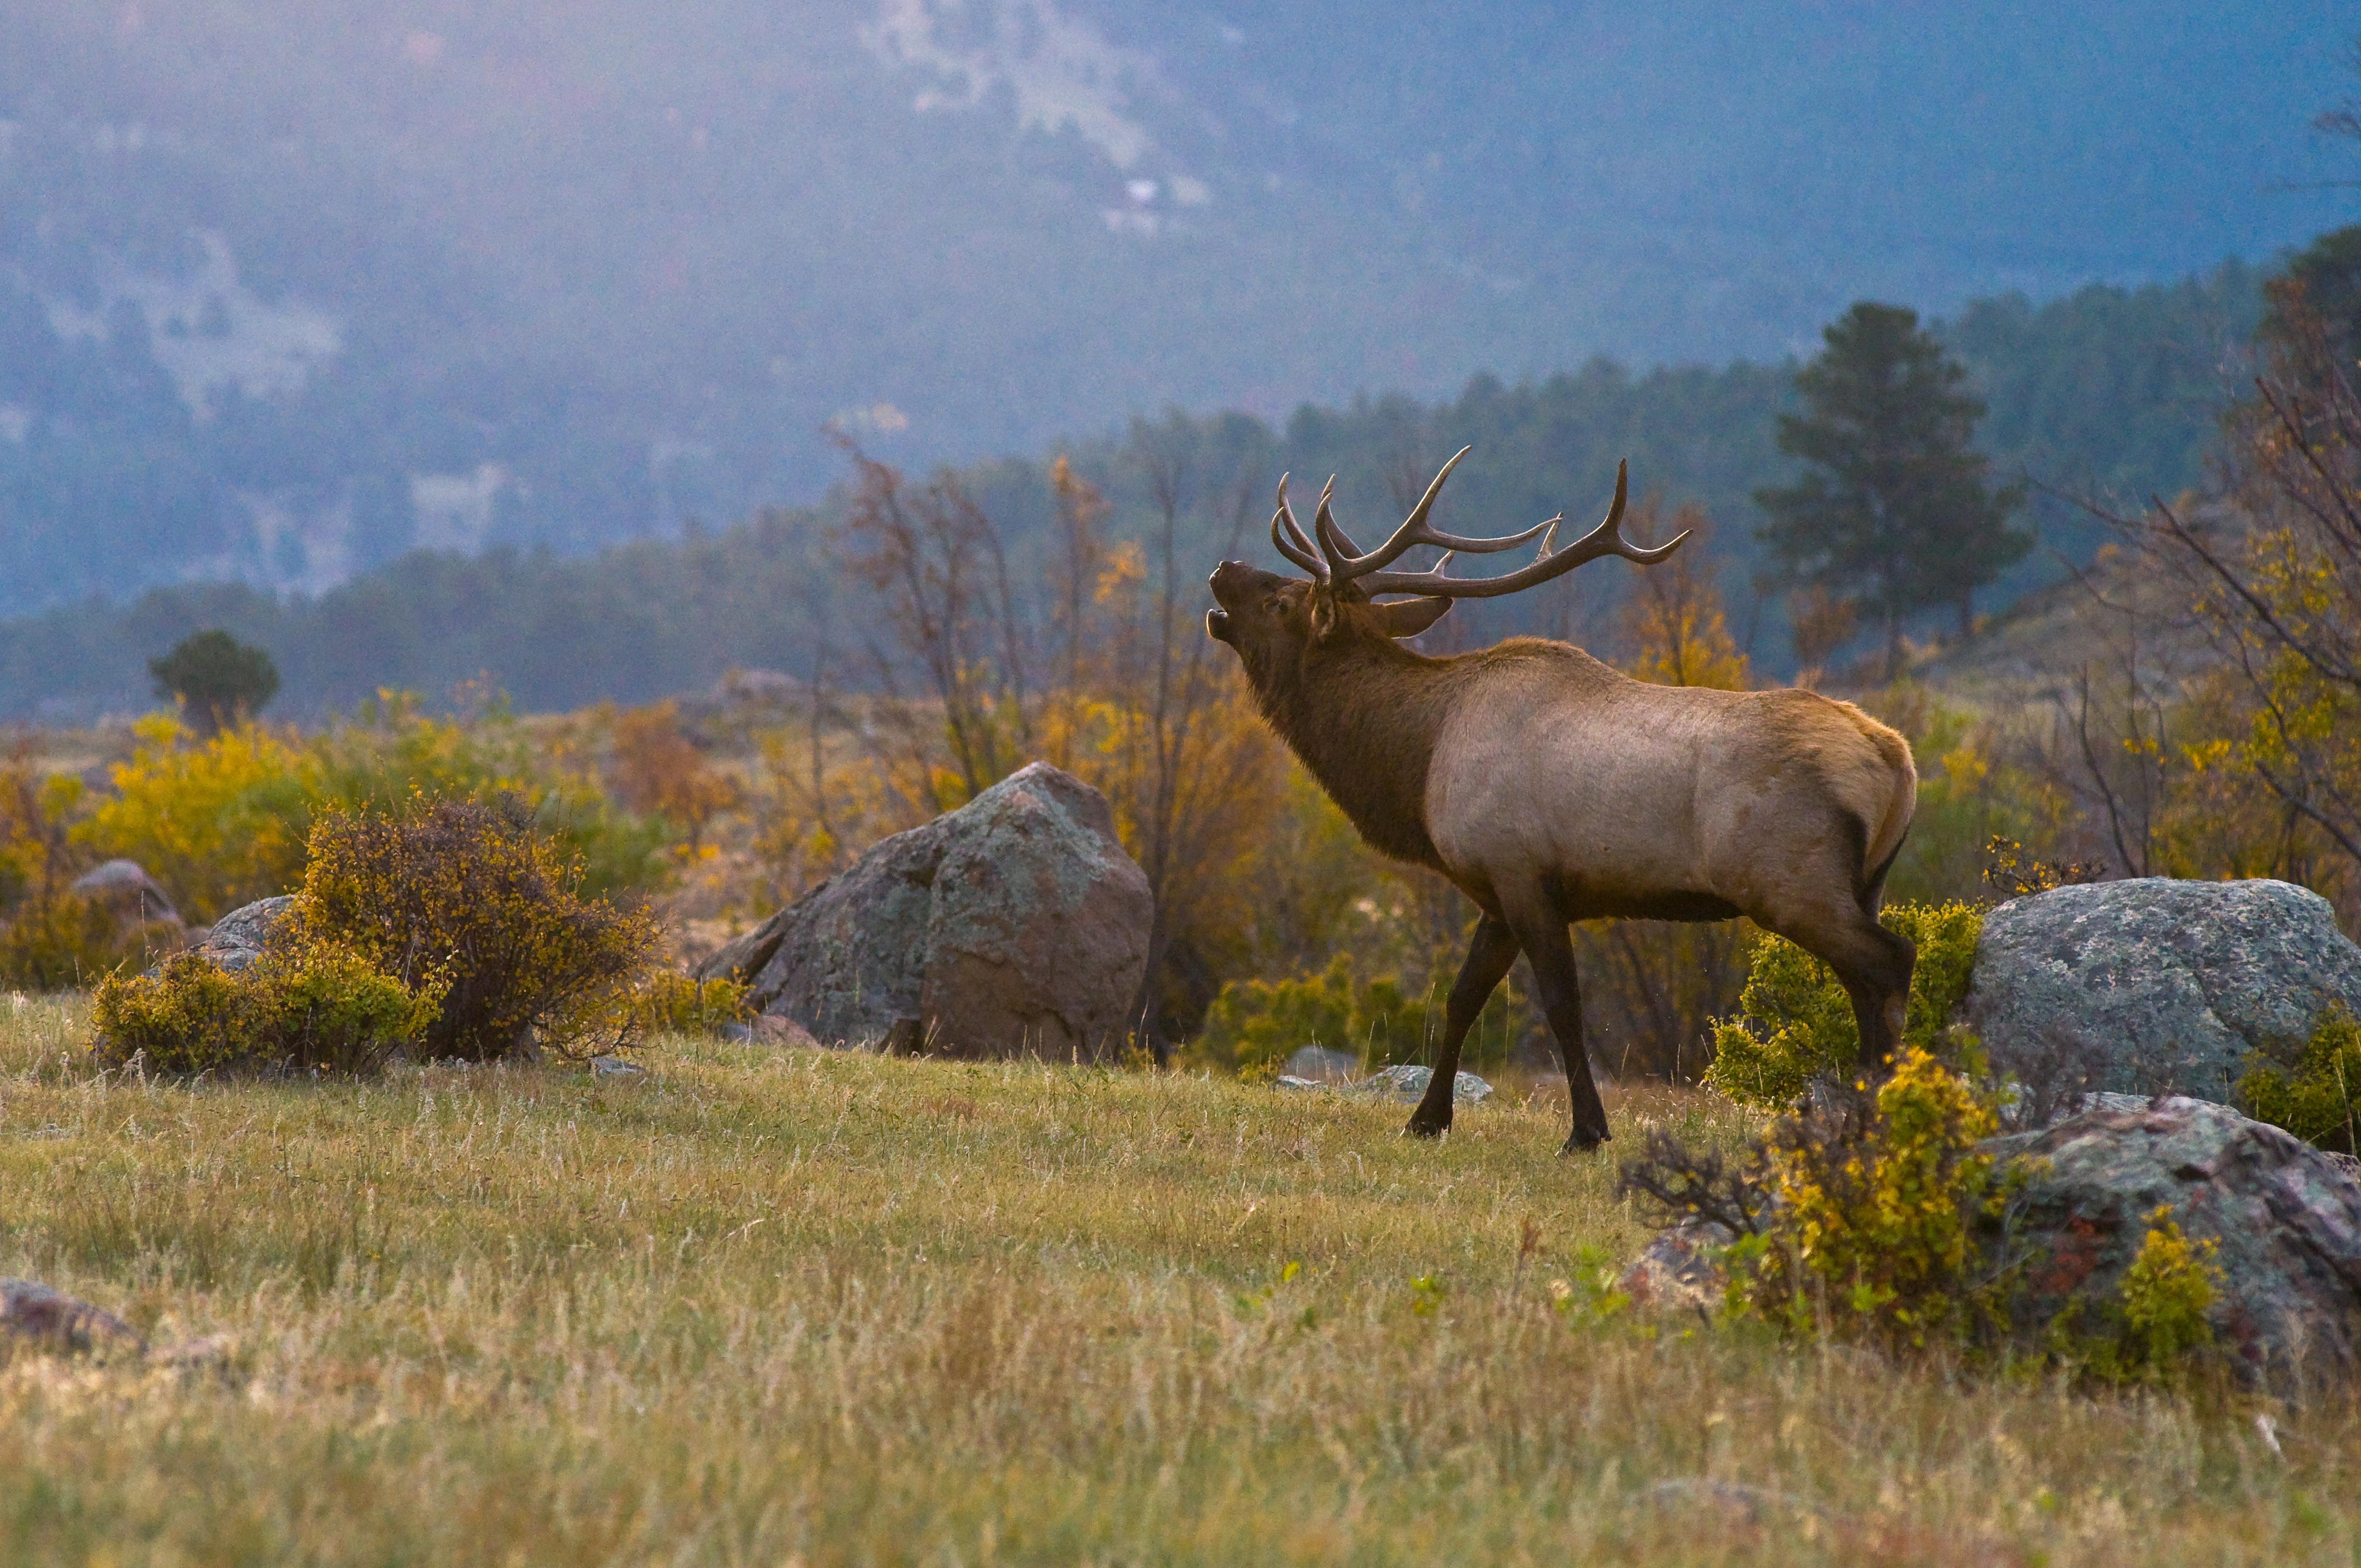 Duane's elk